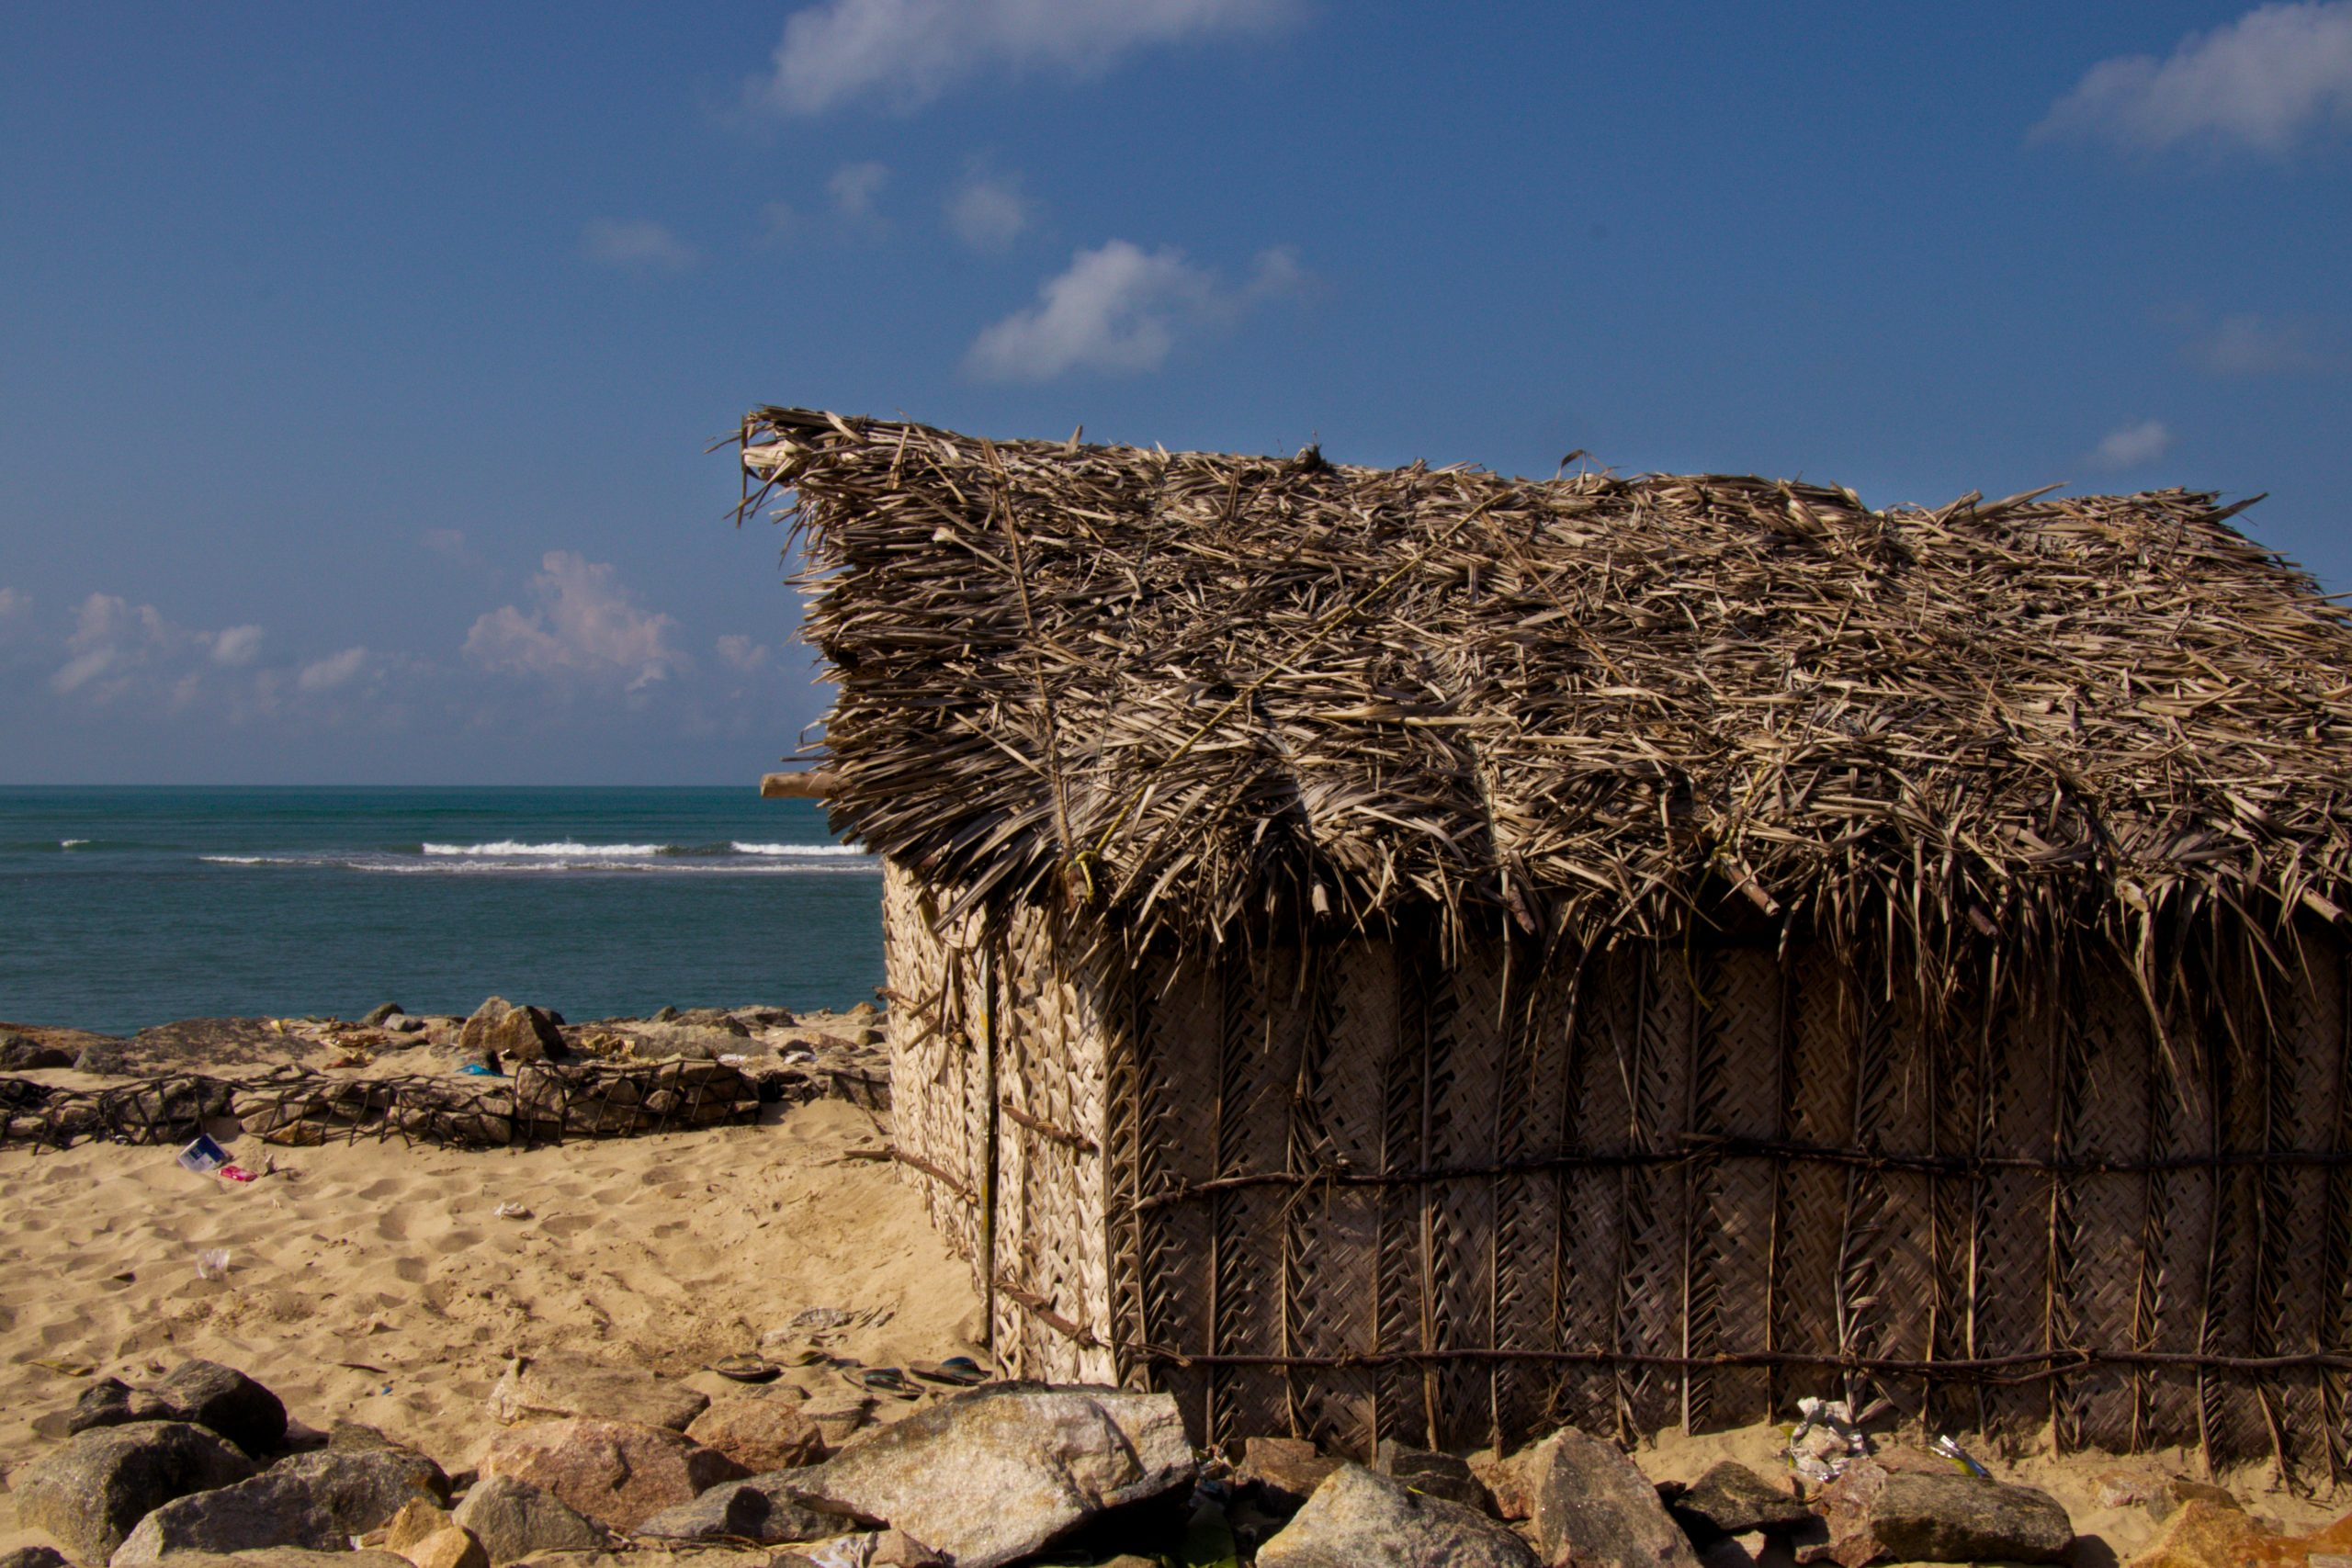 hut on a beach